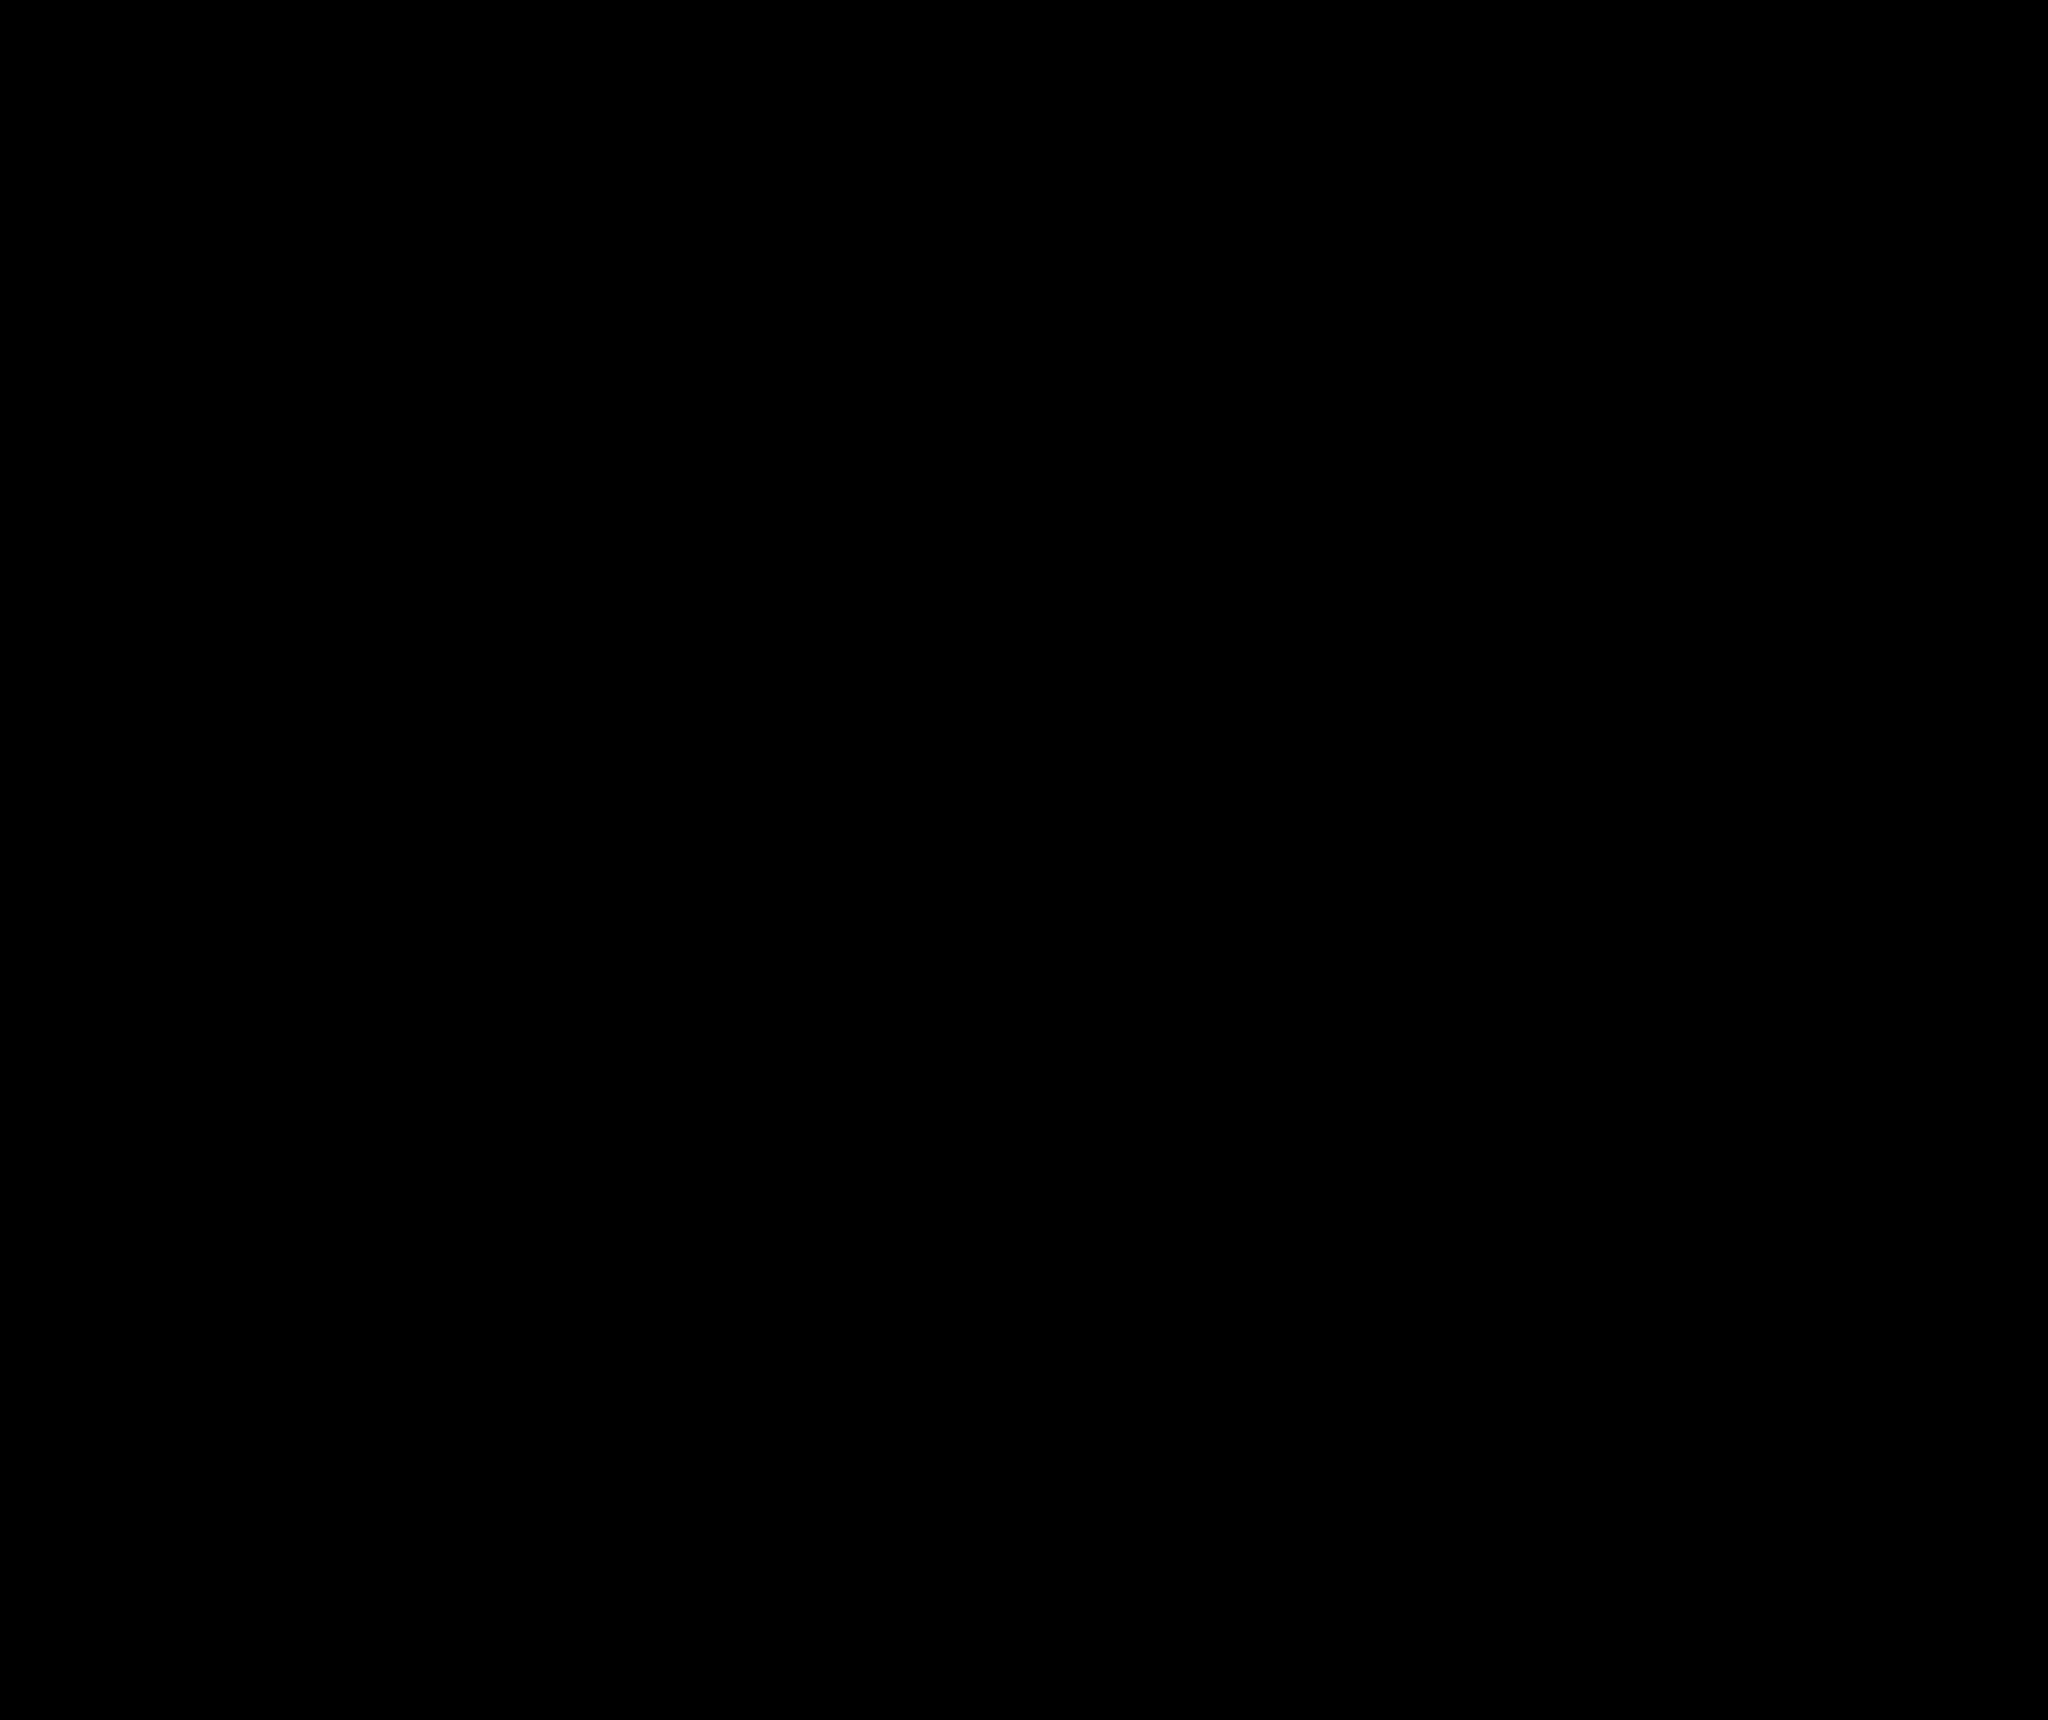 Star Trek Symbole